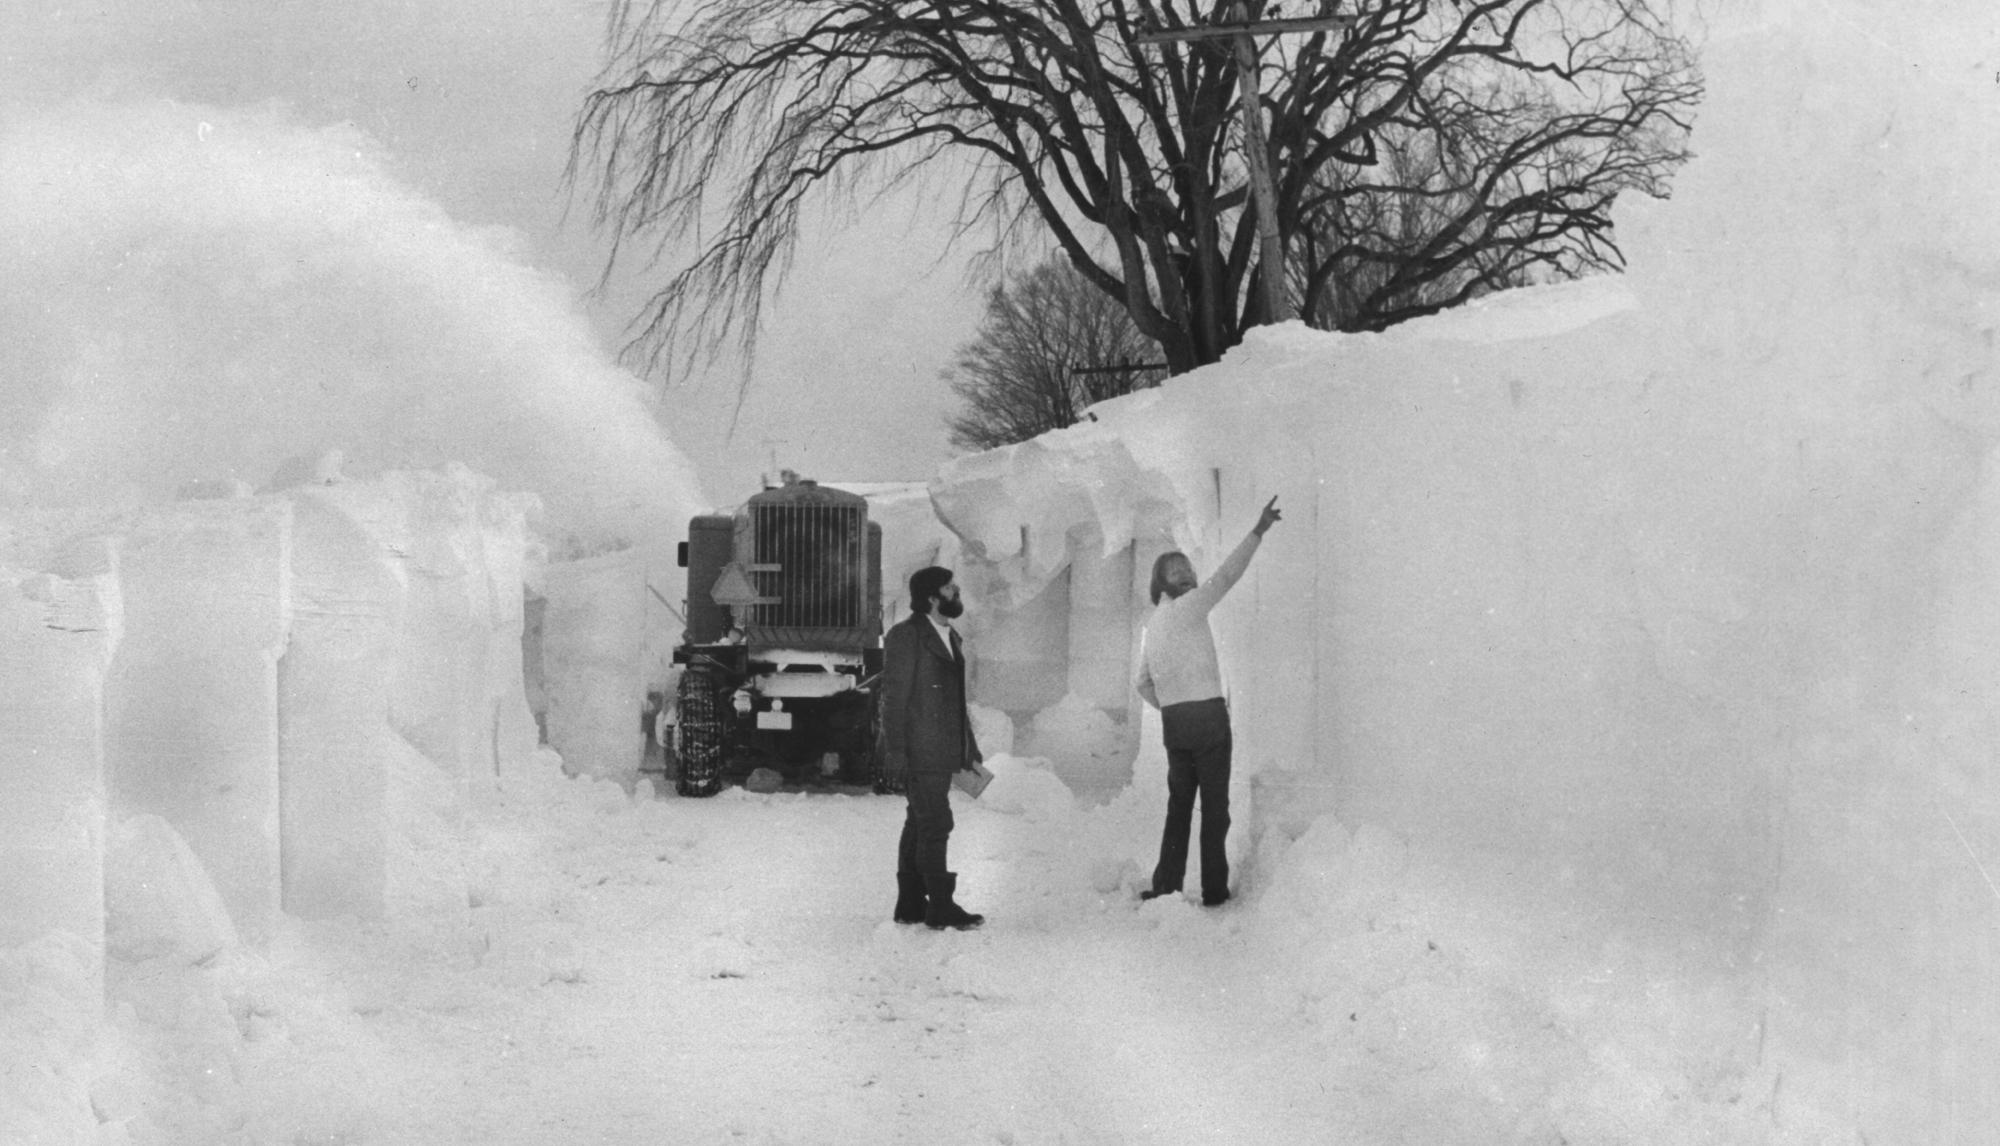 Worst Blizzard Blizzard 171 Western New York Living